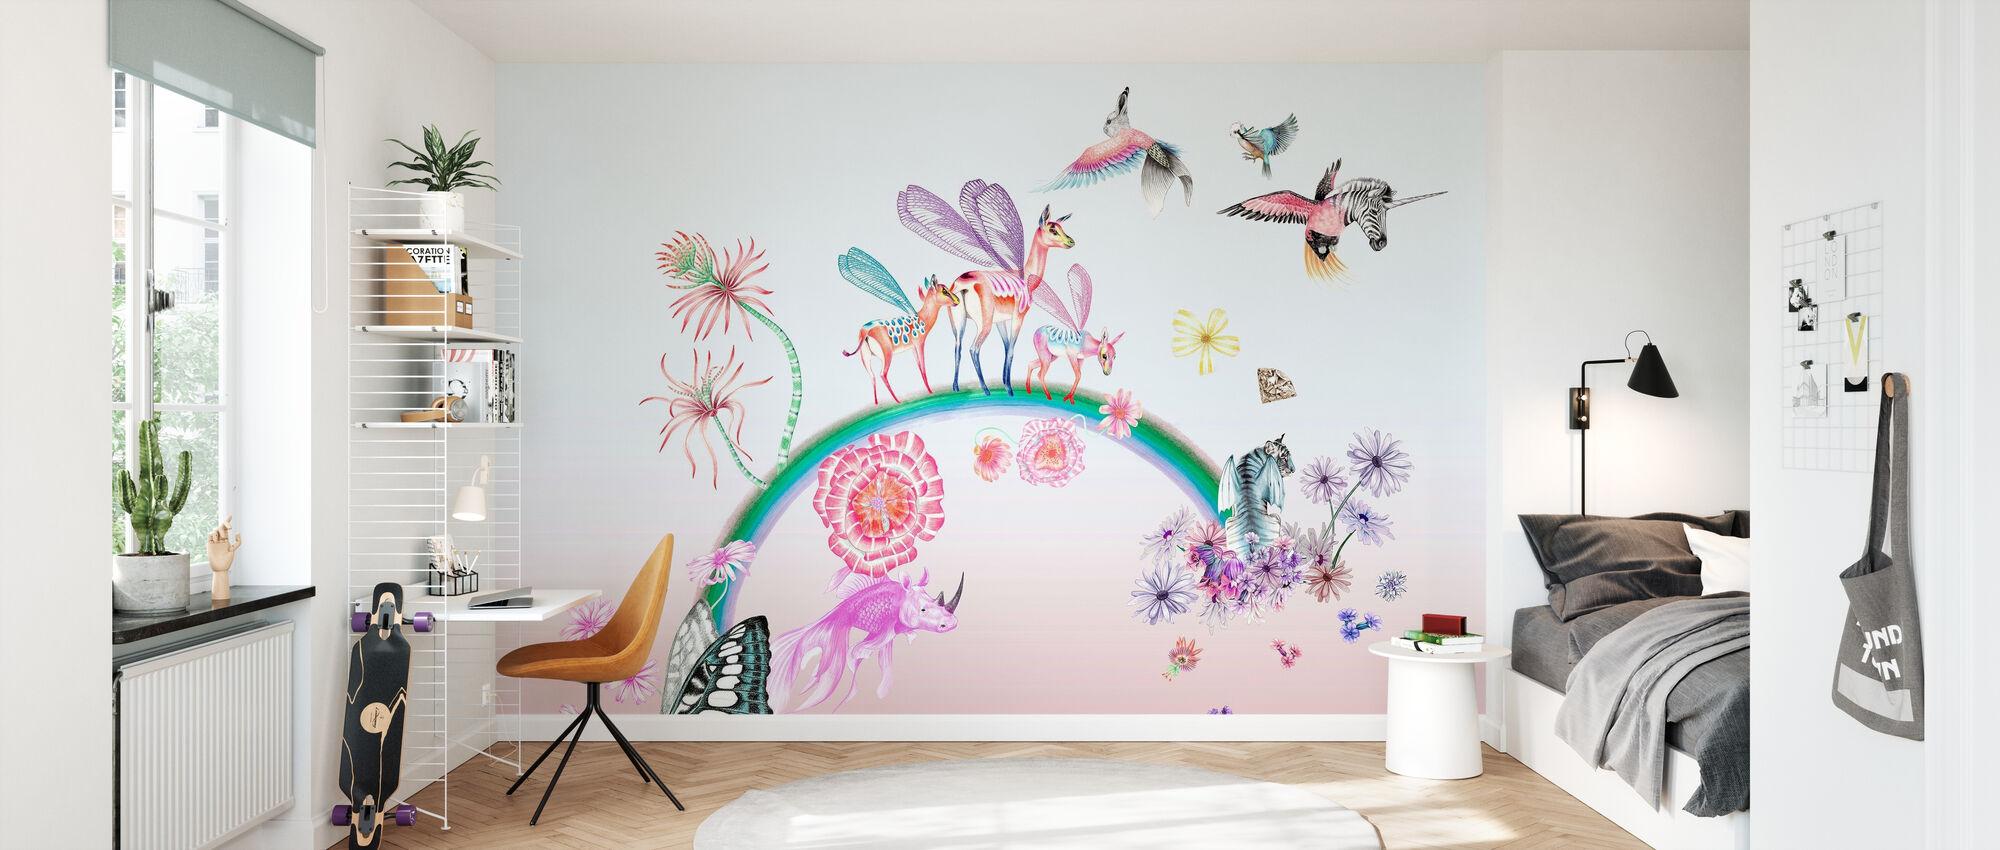 Fables-Ombre - Wallpaper - Kids Room